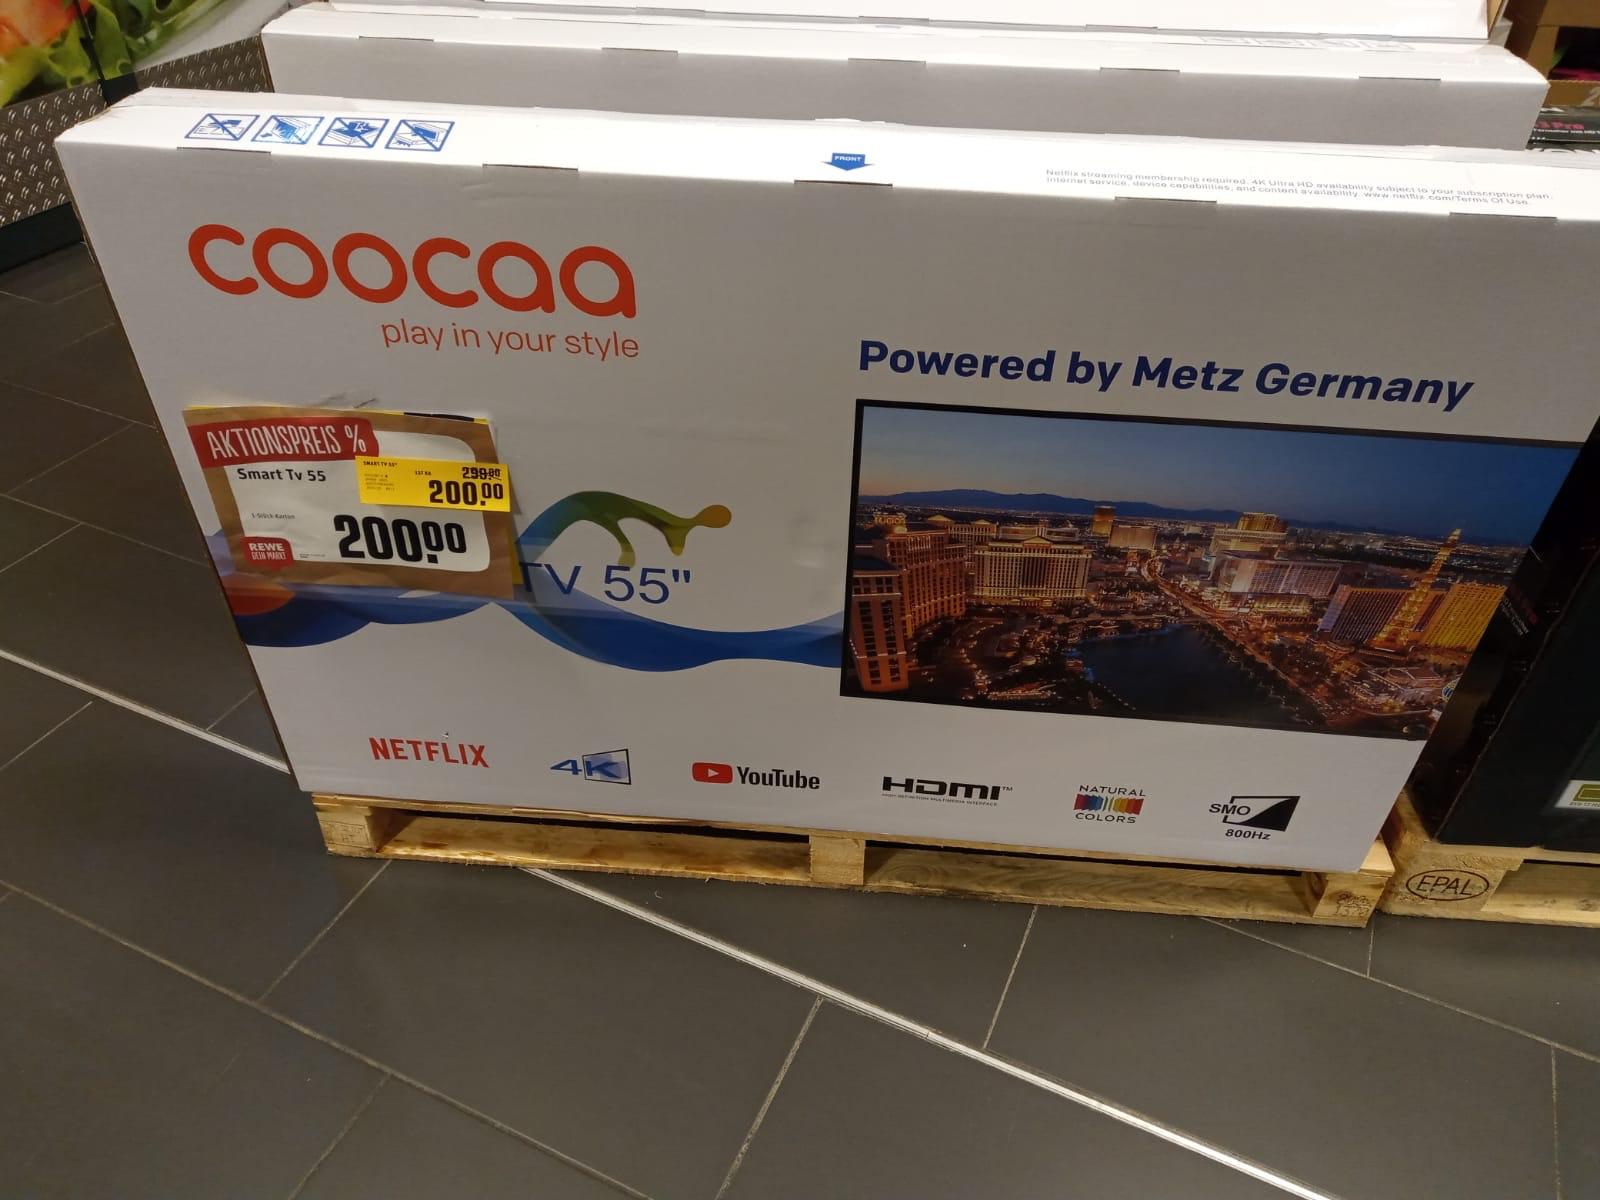 Coocaa 55U2A13G 55 Zoll Smart LED Fernseher (139cm) im Rewe EKZ VOGELHERD in Nürnberg